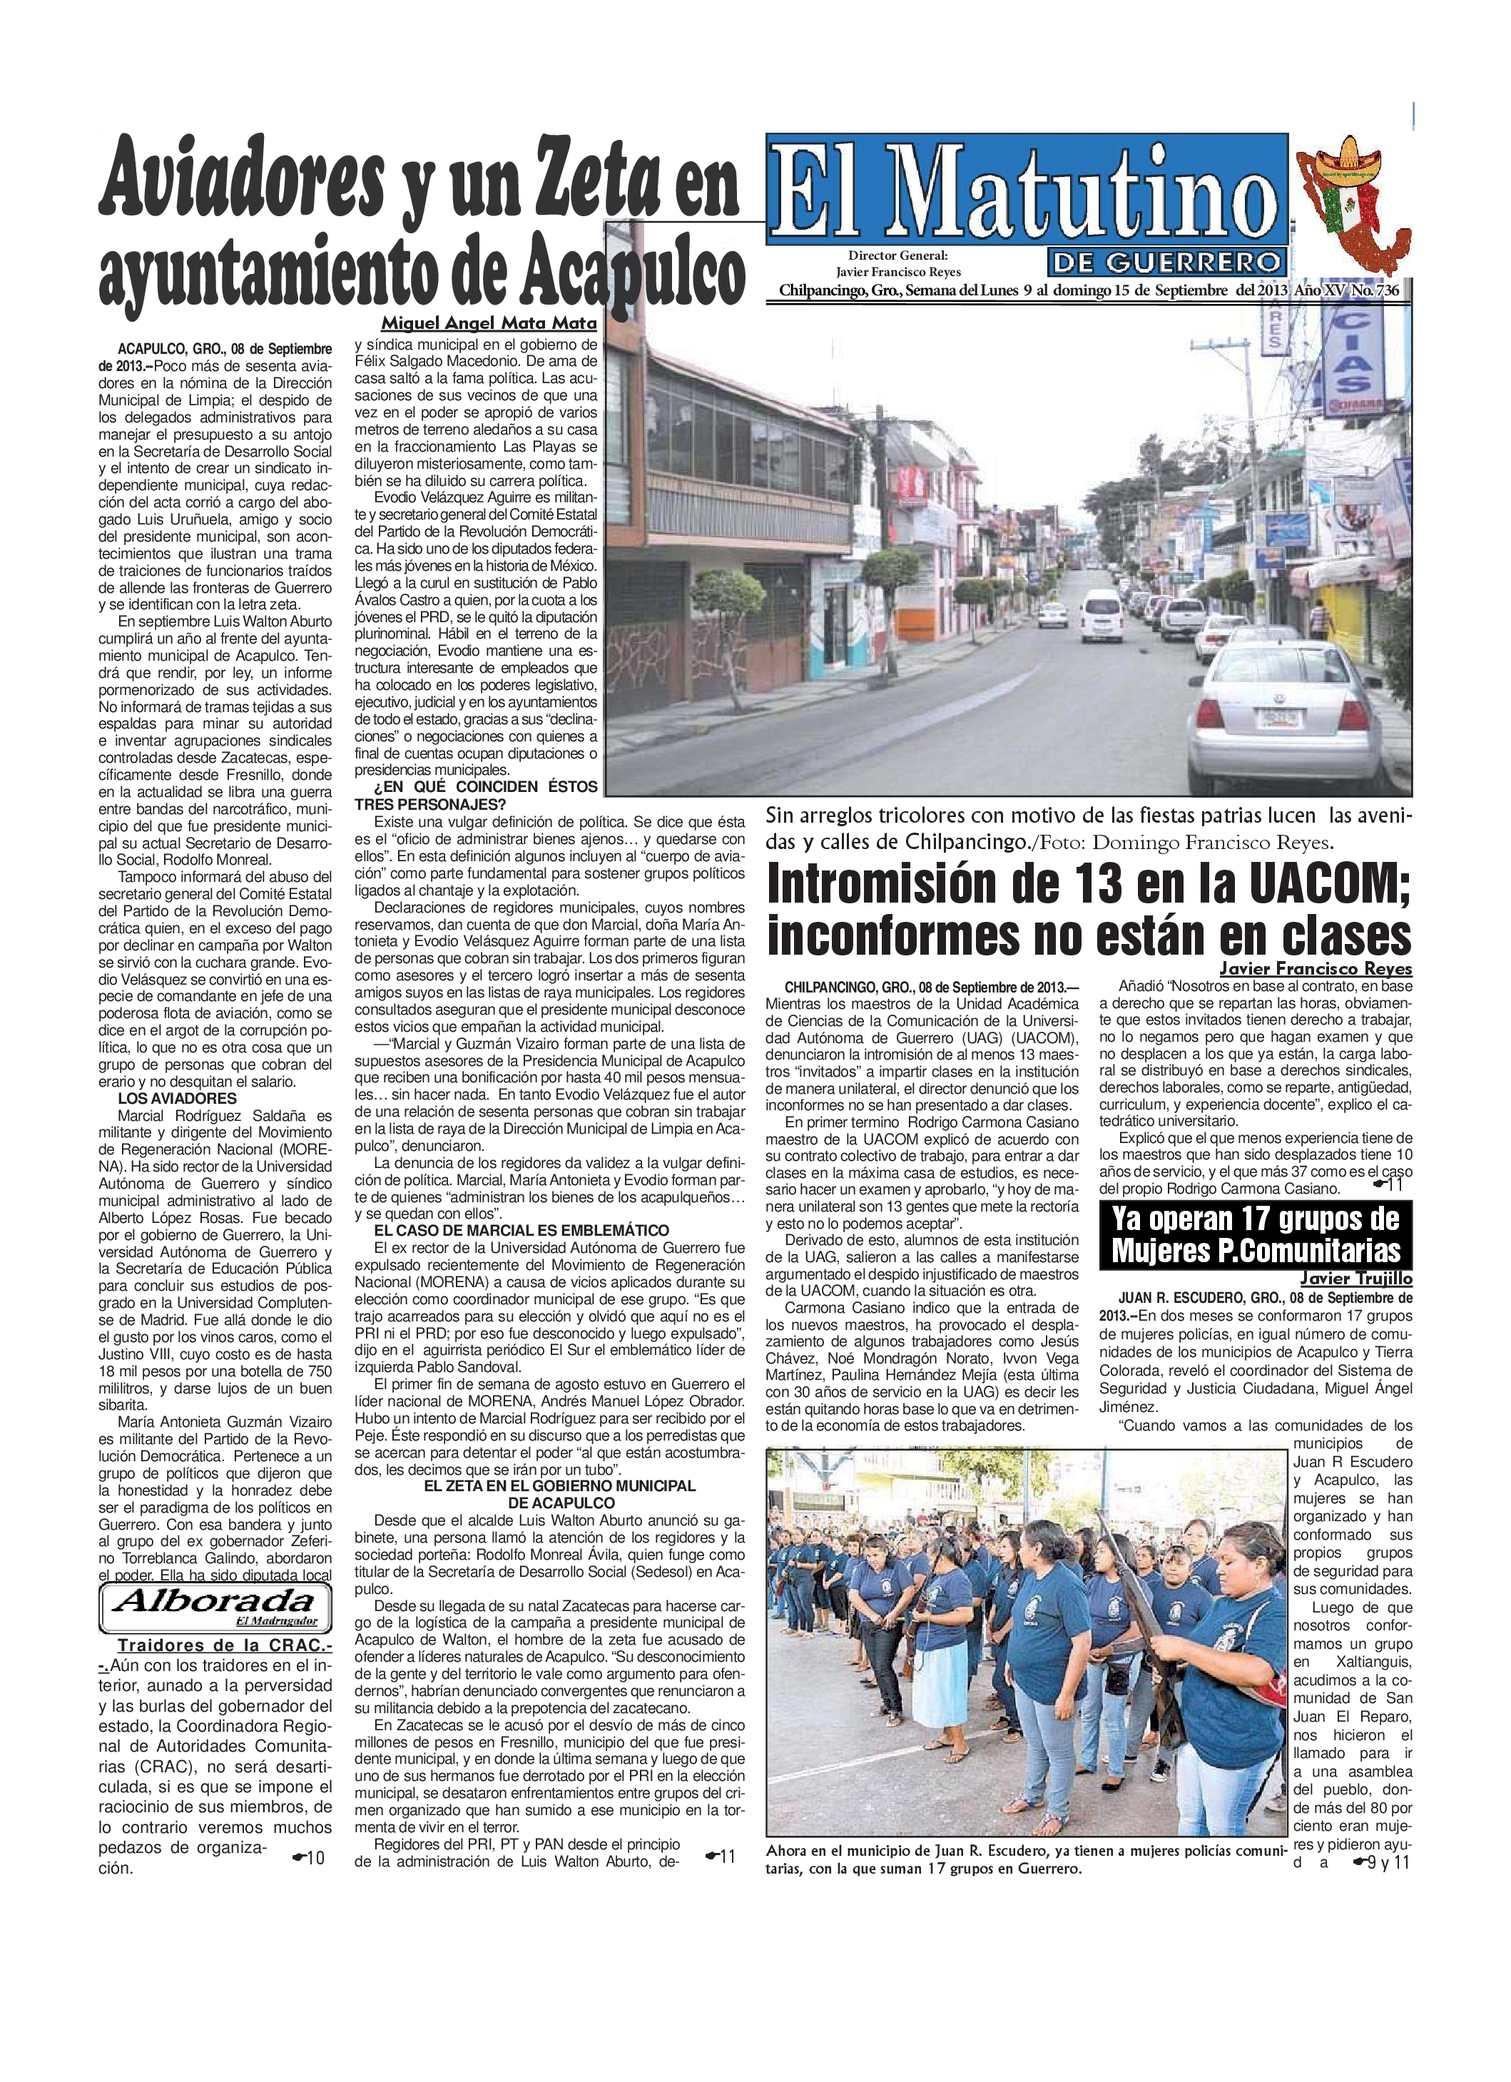 Calaméo - Semana del Lunes 9 al domingo 15 de Septiembre del 2013 ...